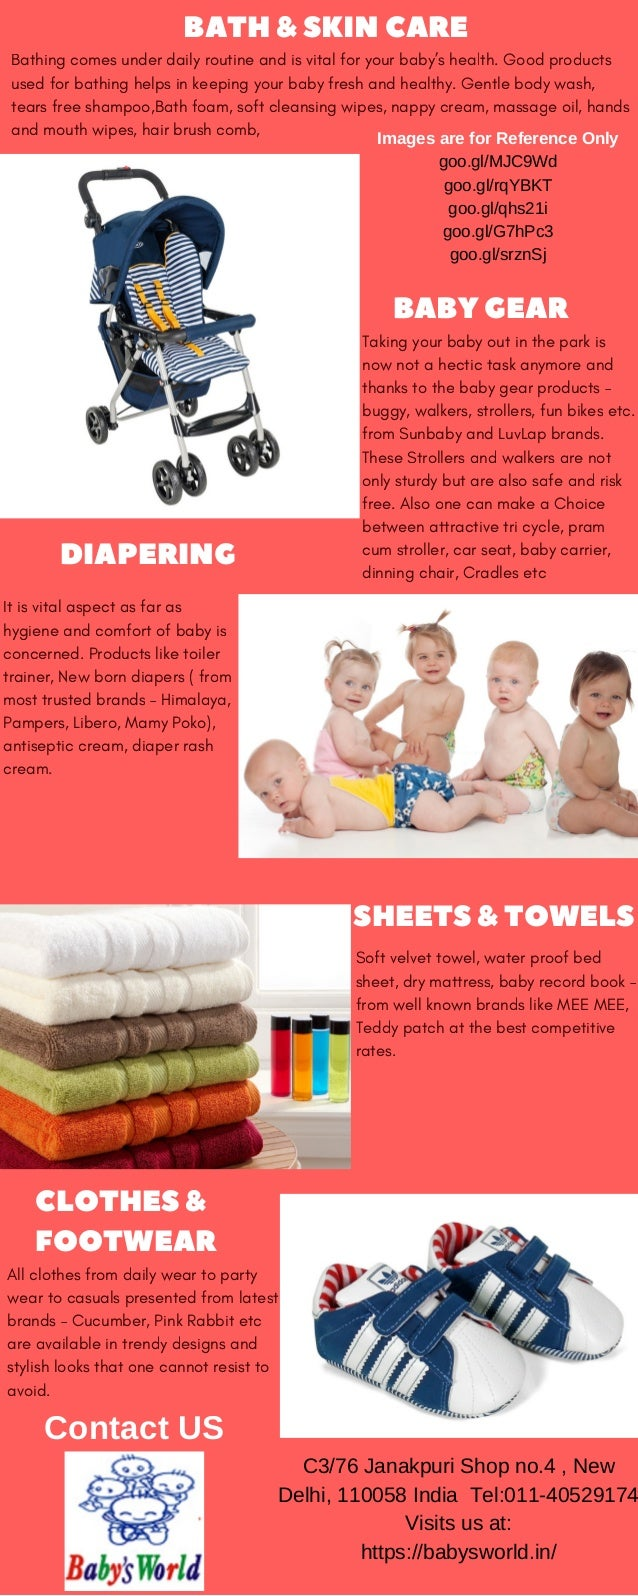 Baby Products Range